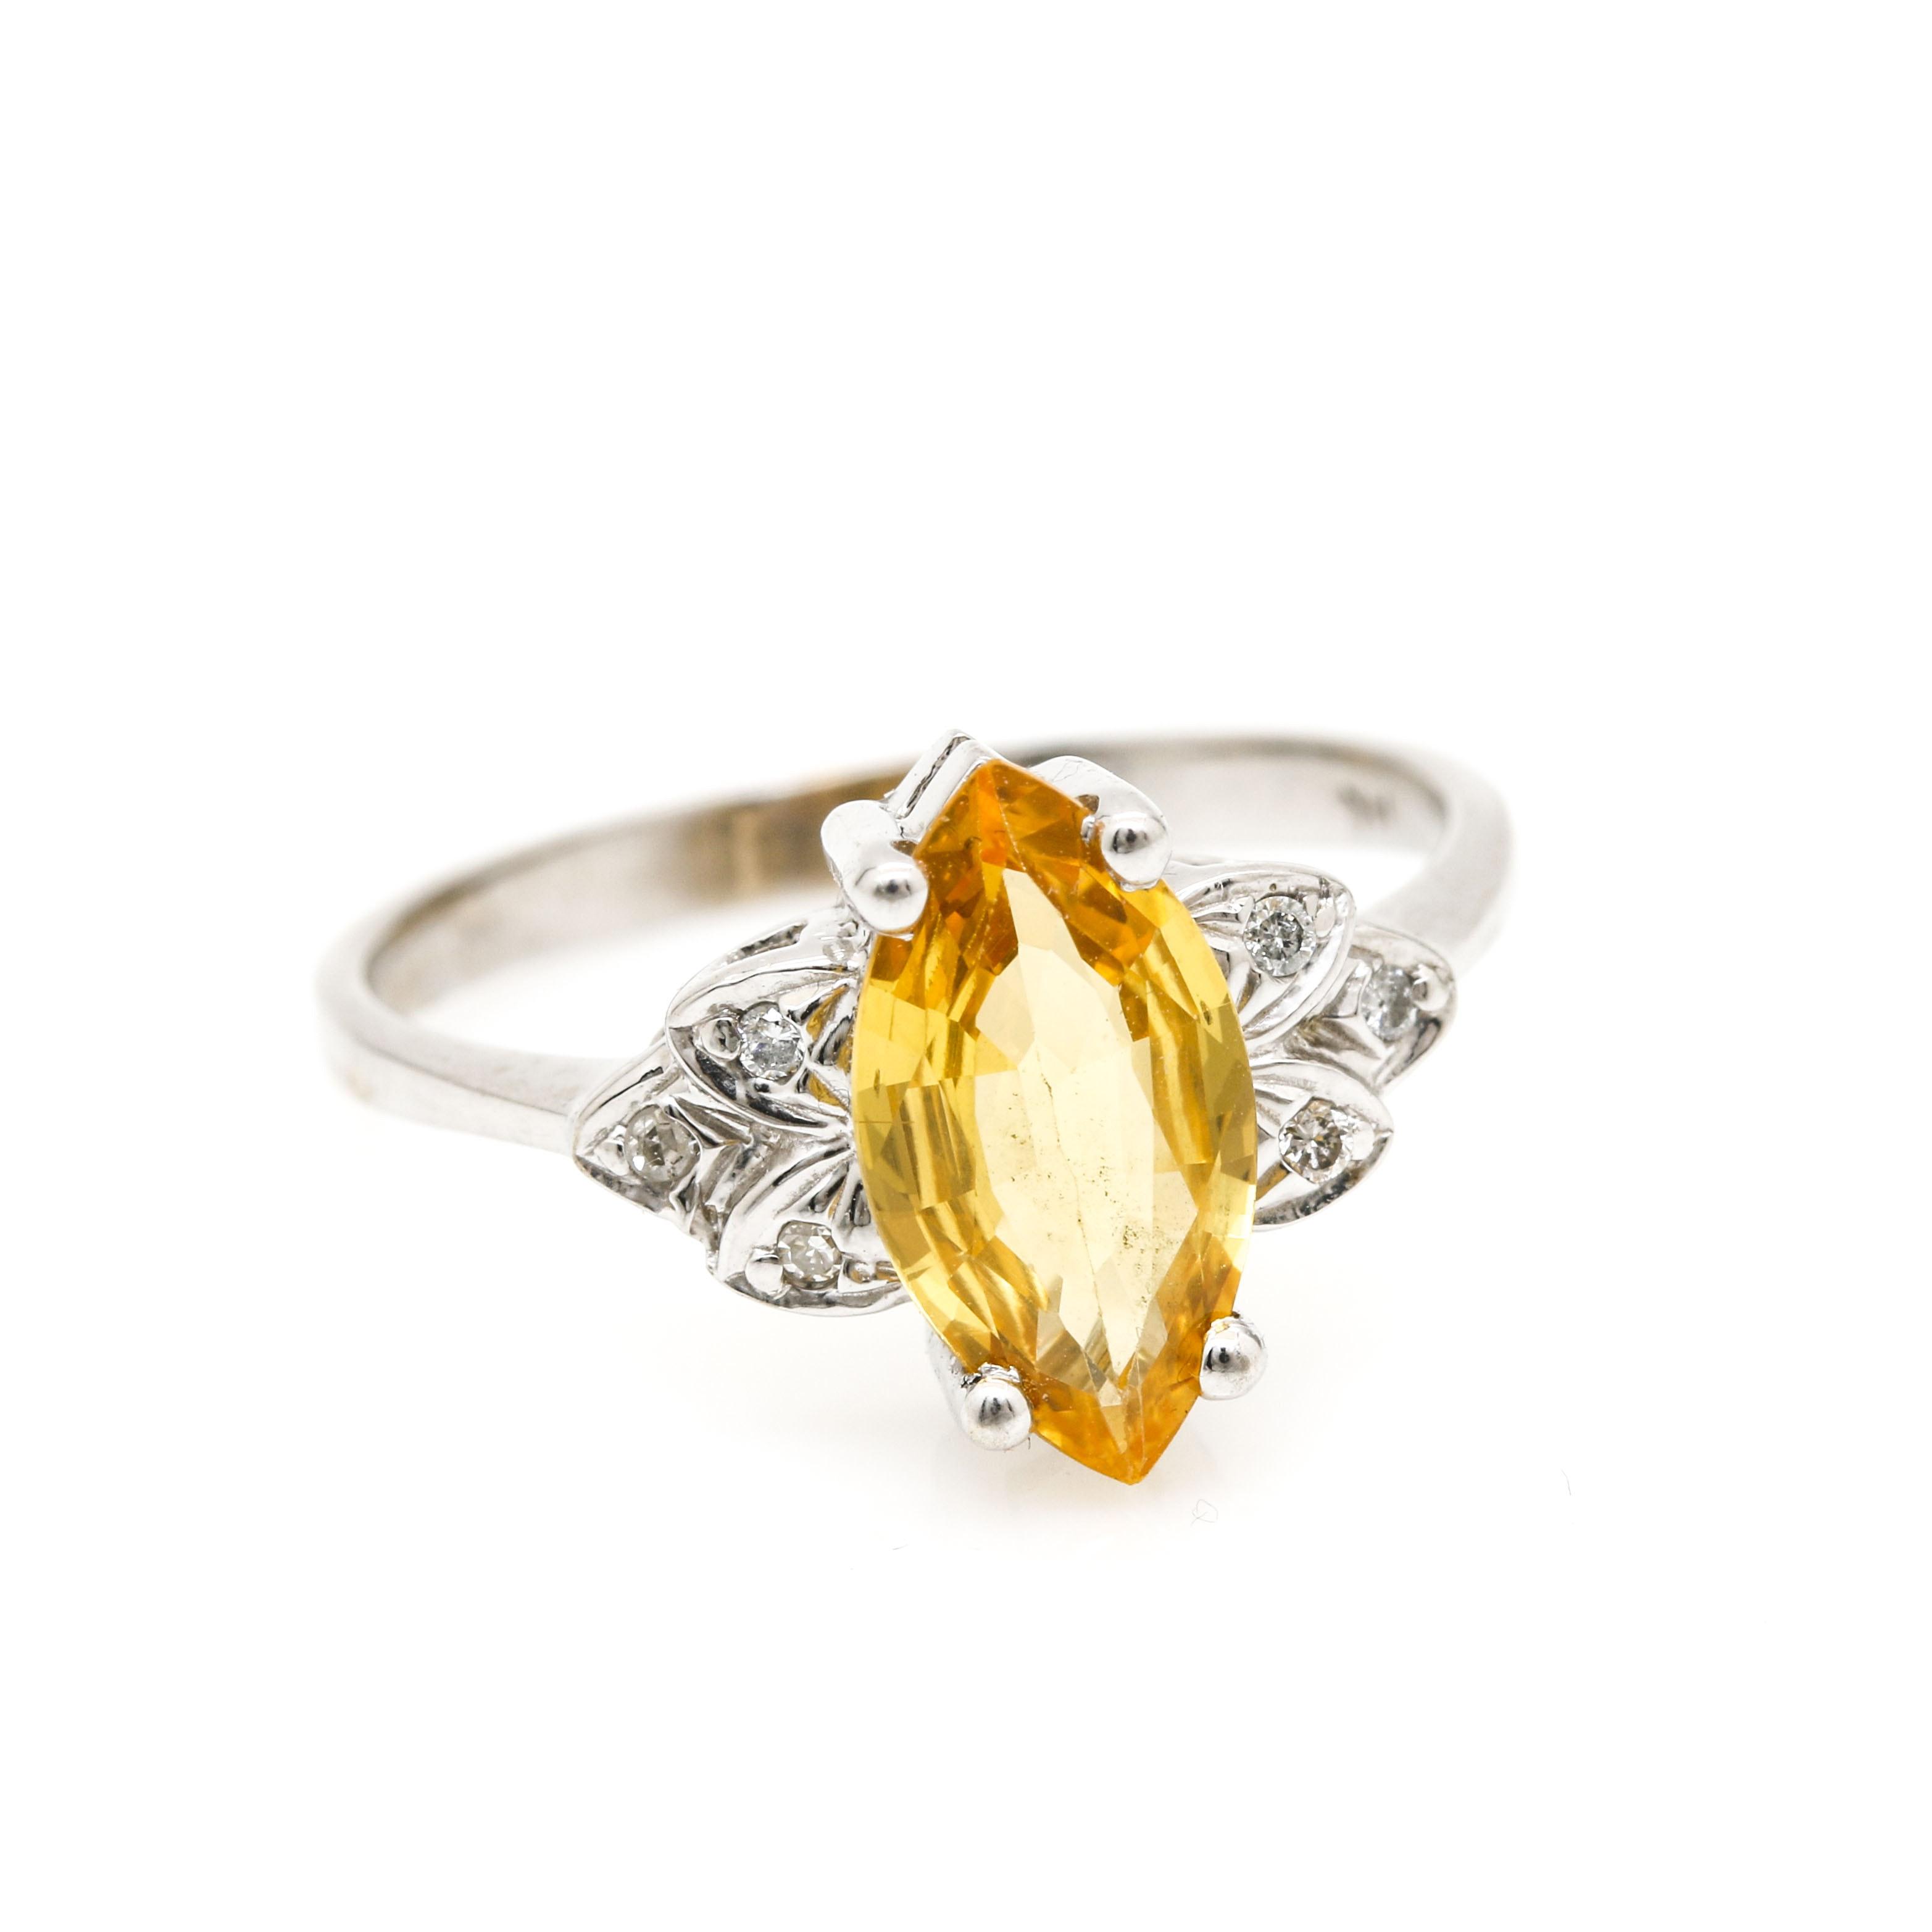 14K White Gold 2.12 CT Yellow Sapphire and Diamond Ring